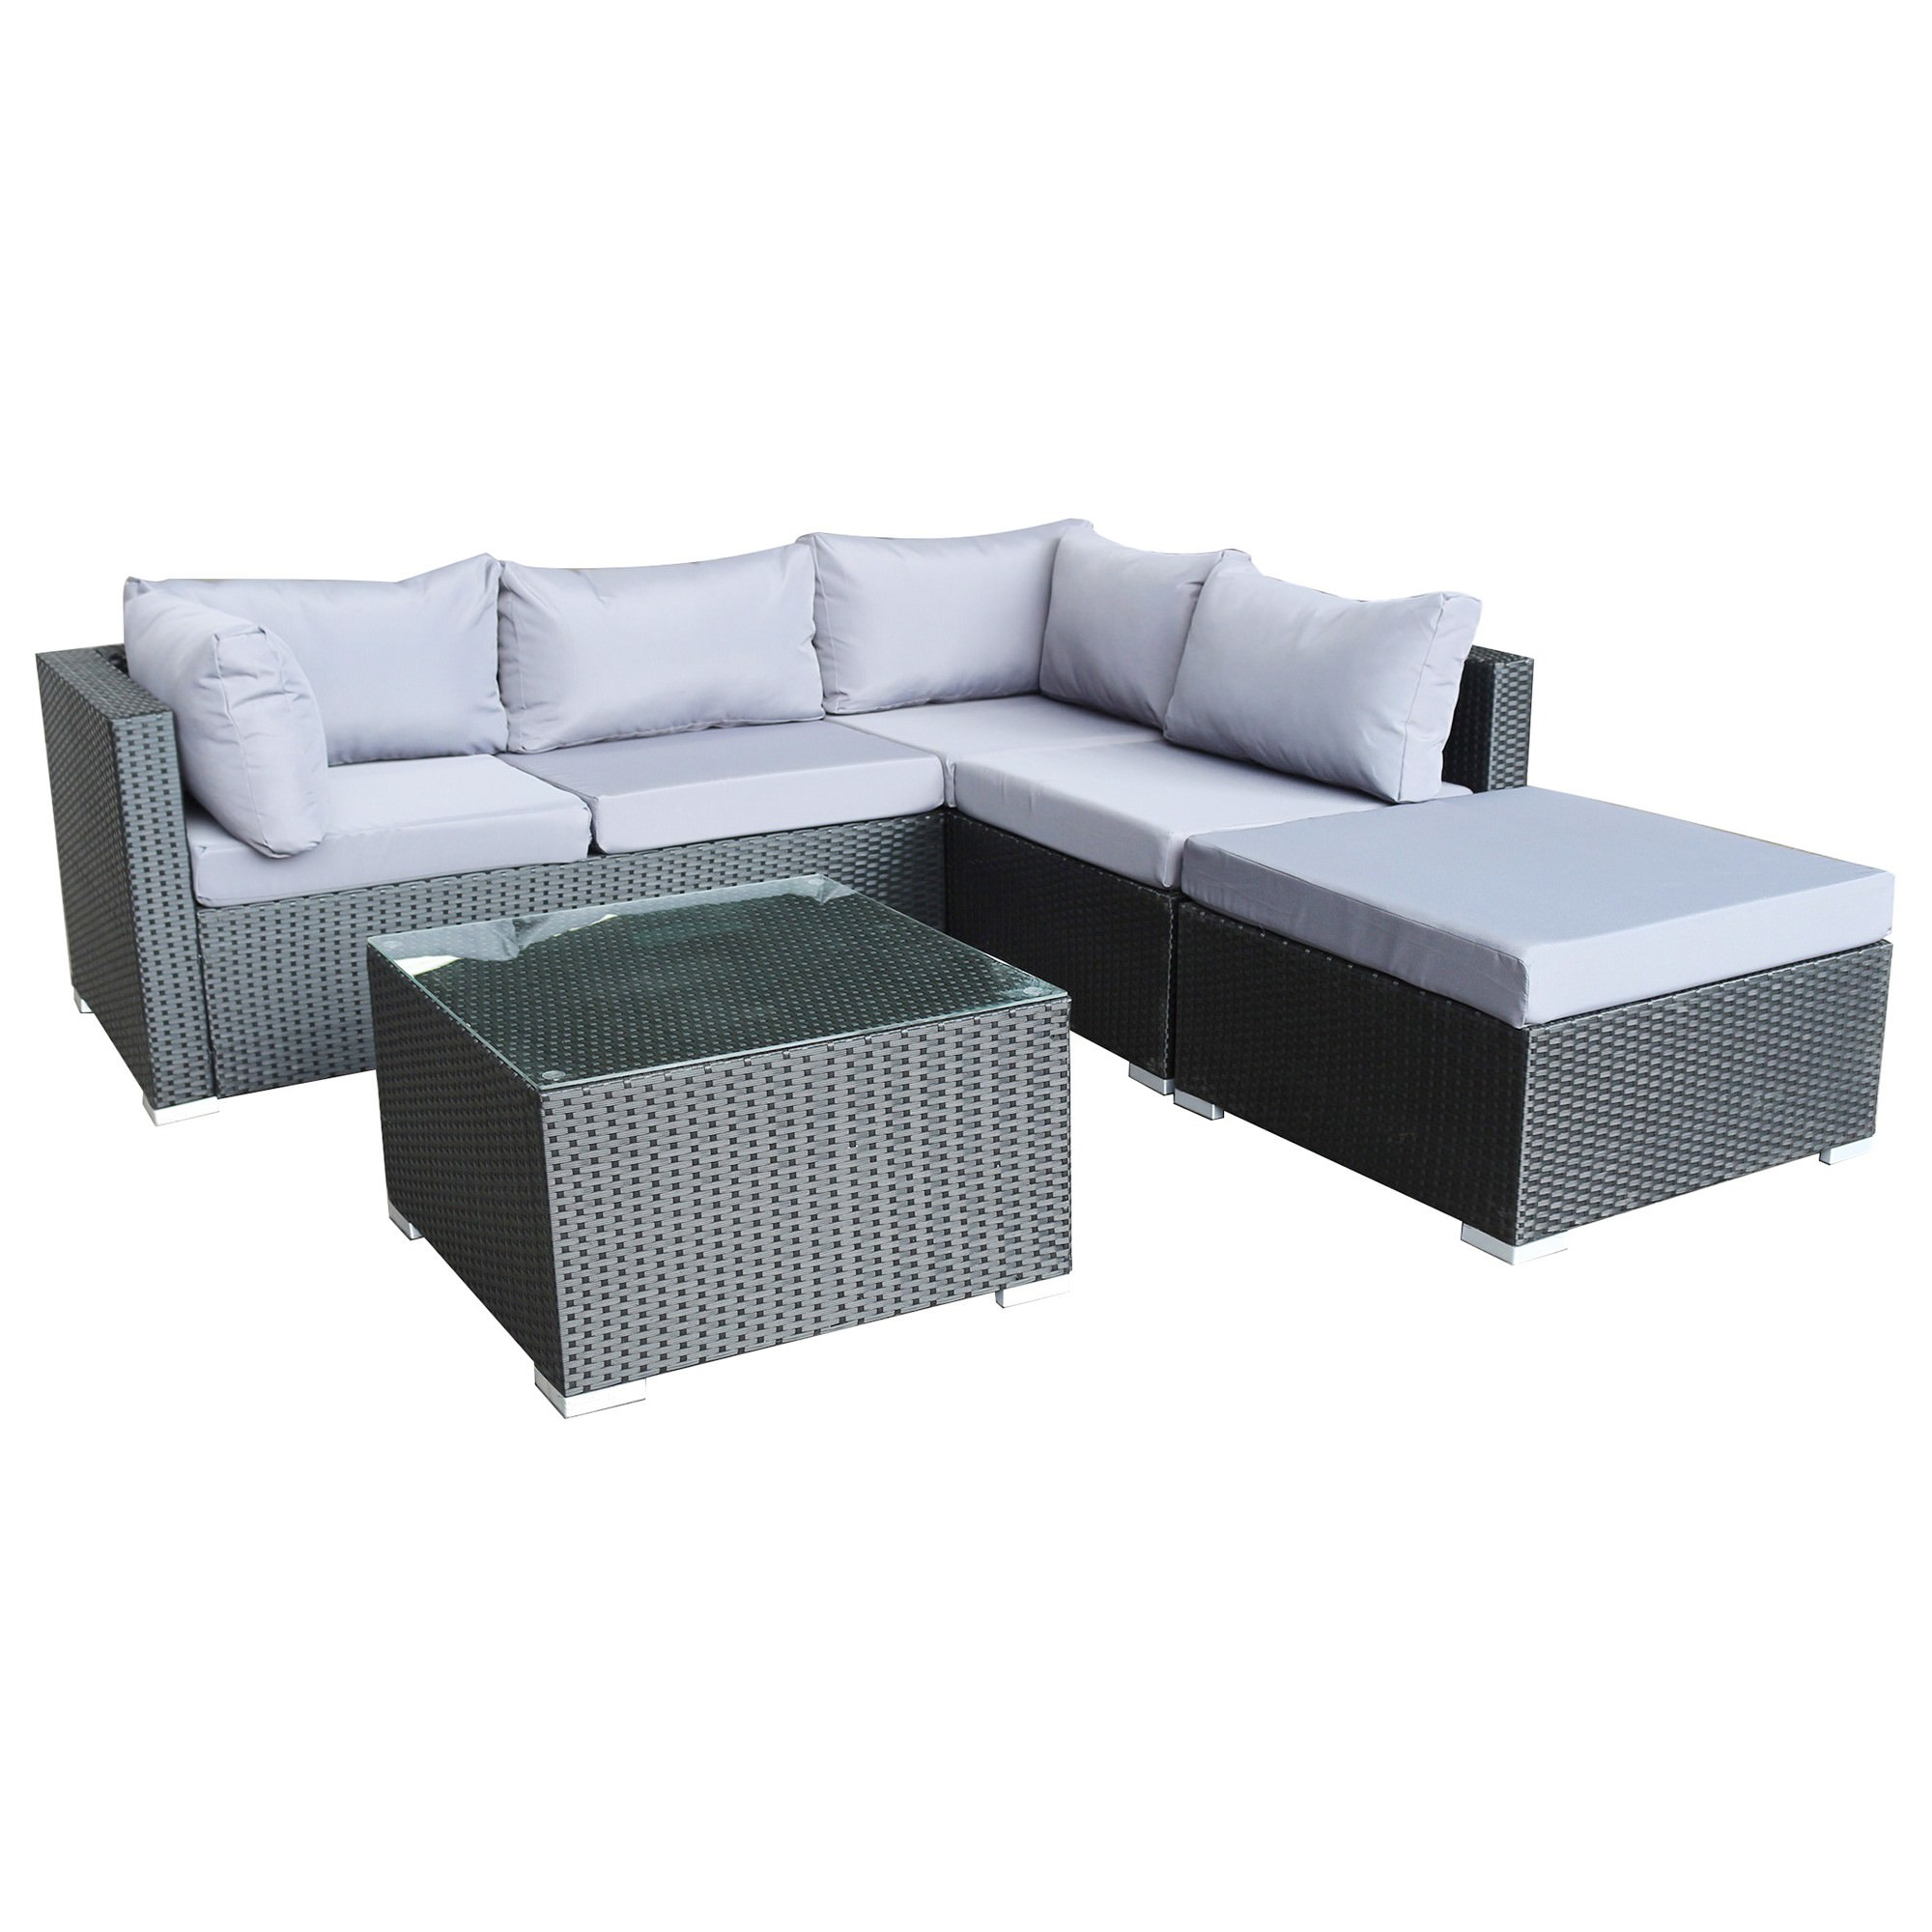 Levanzo 4 Piece Outdoor Wicker Corner Sofa Set, Black